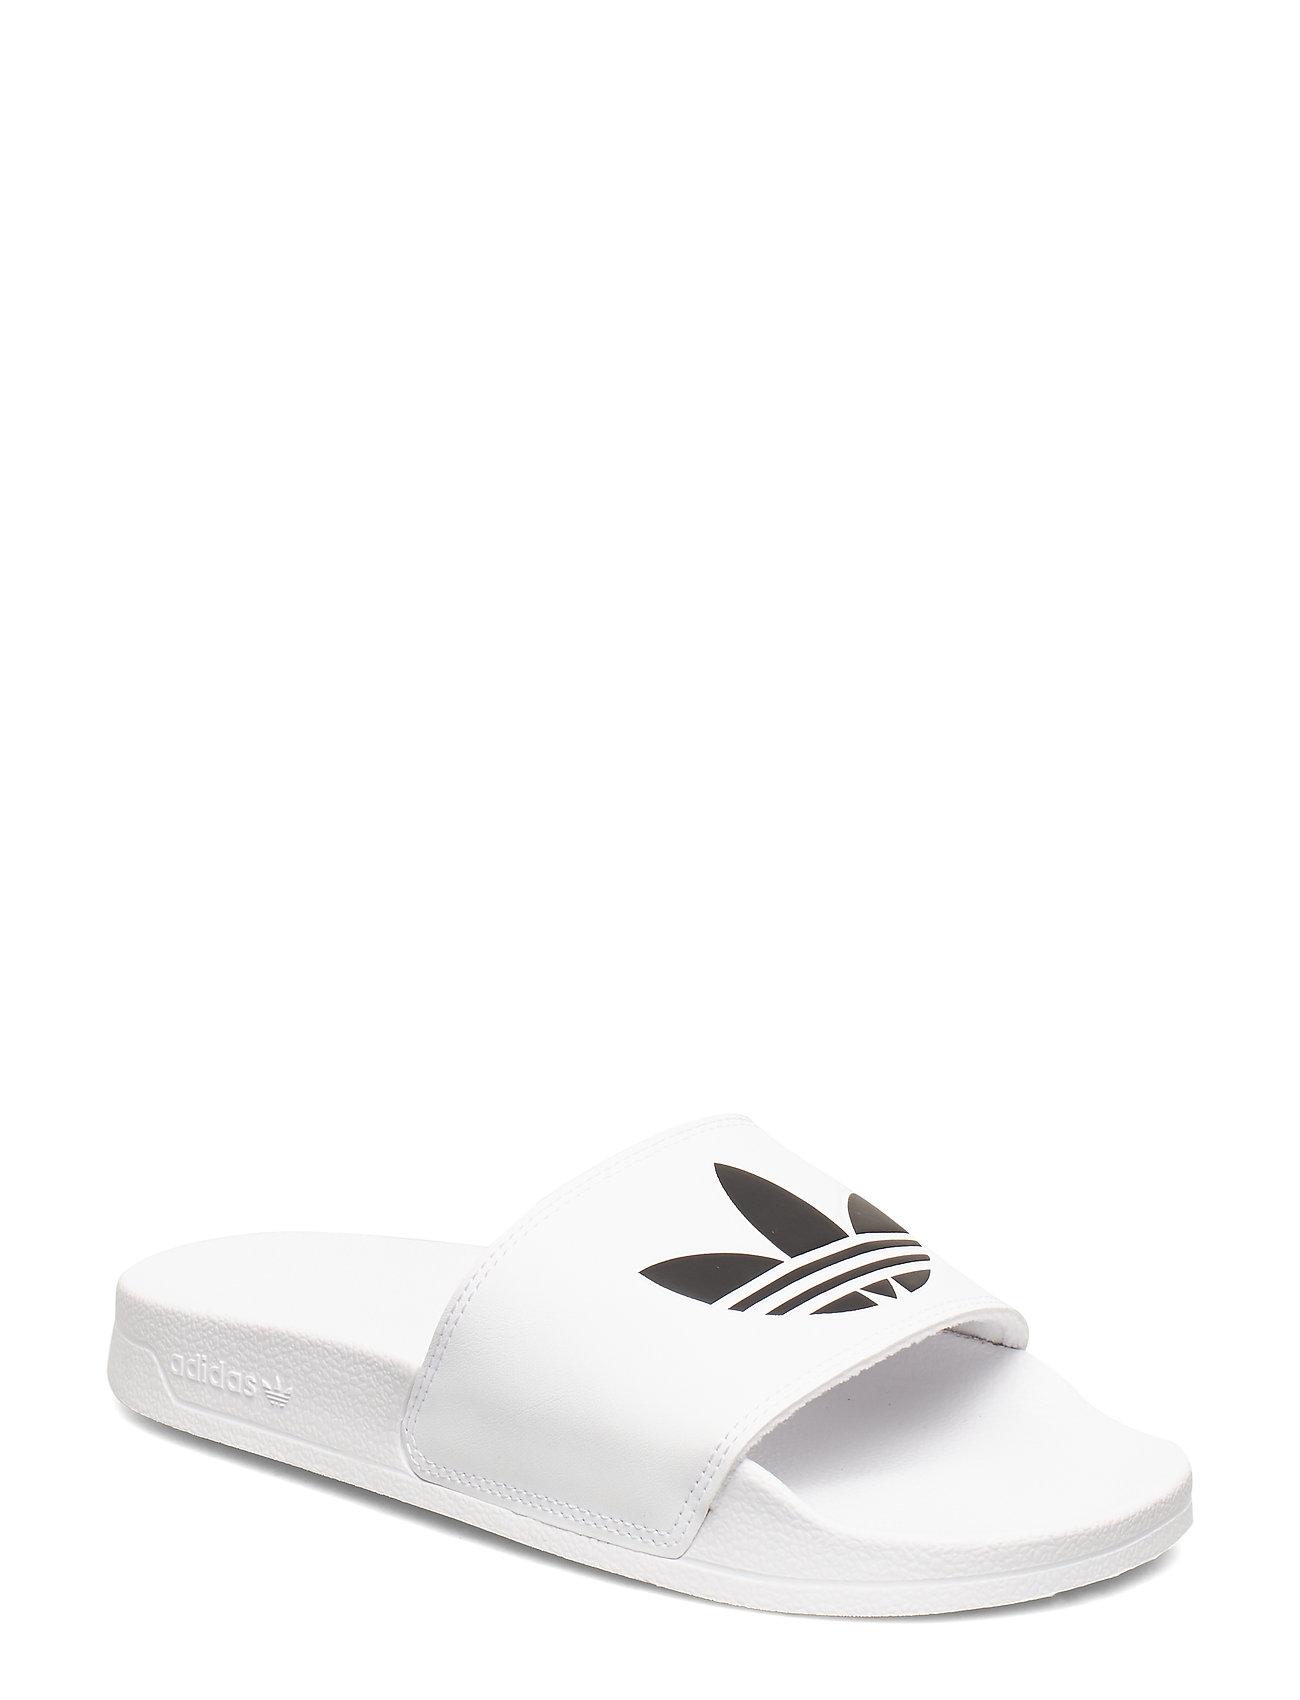 adidas Originals ADILETTE LITE J - FTWWHT/CBLACK/FTWWHT